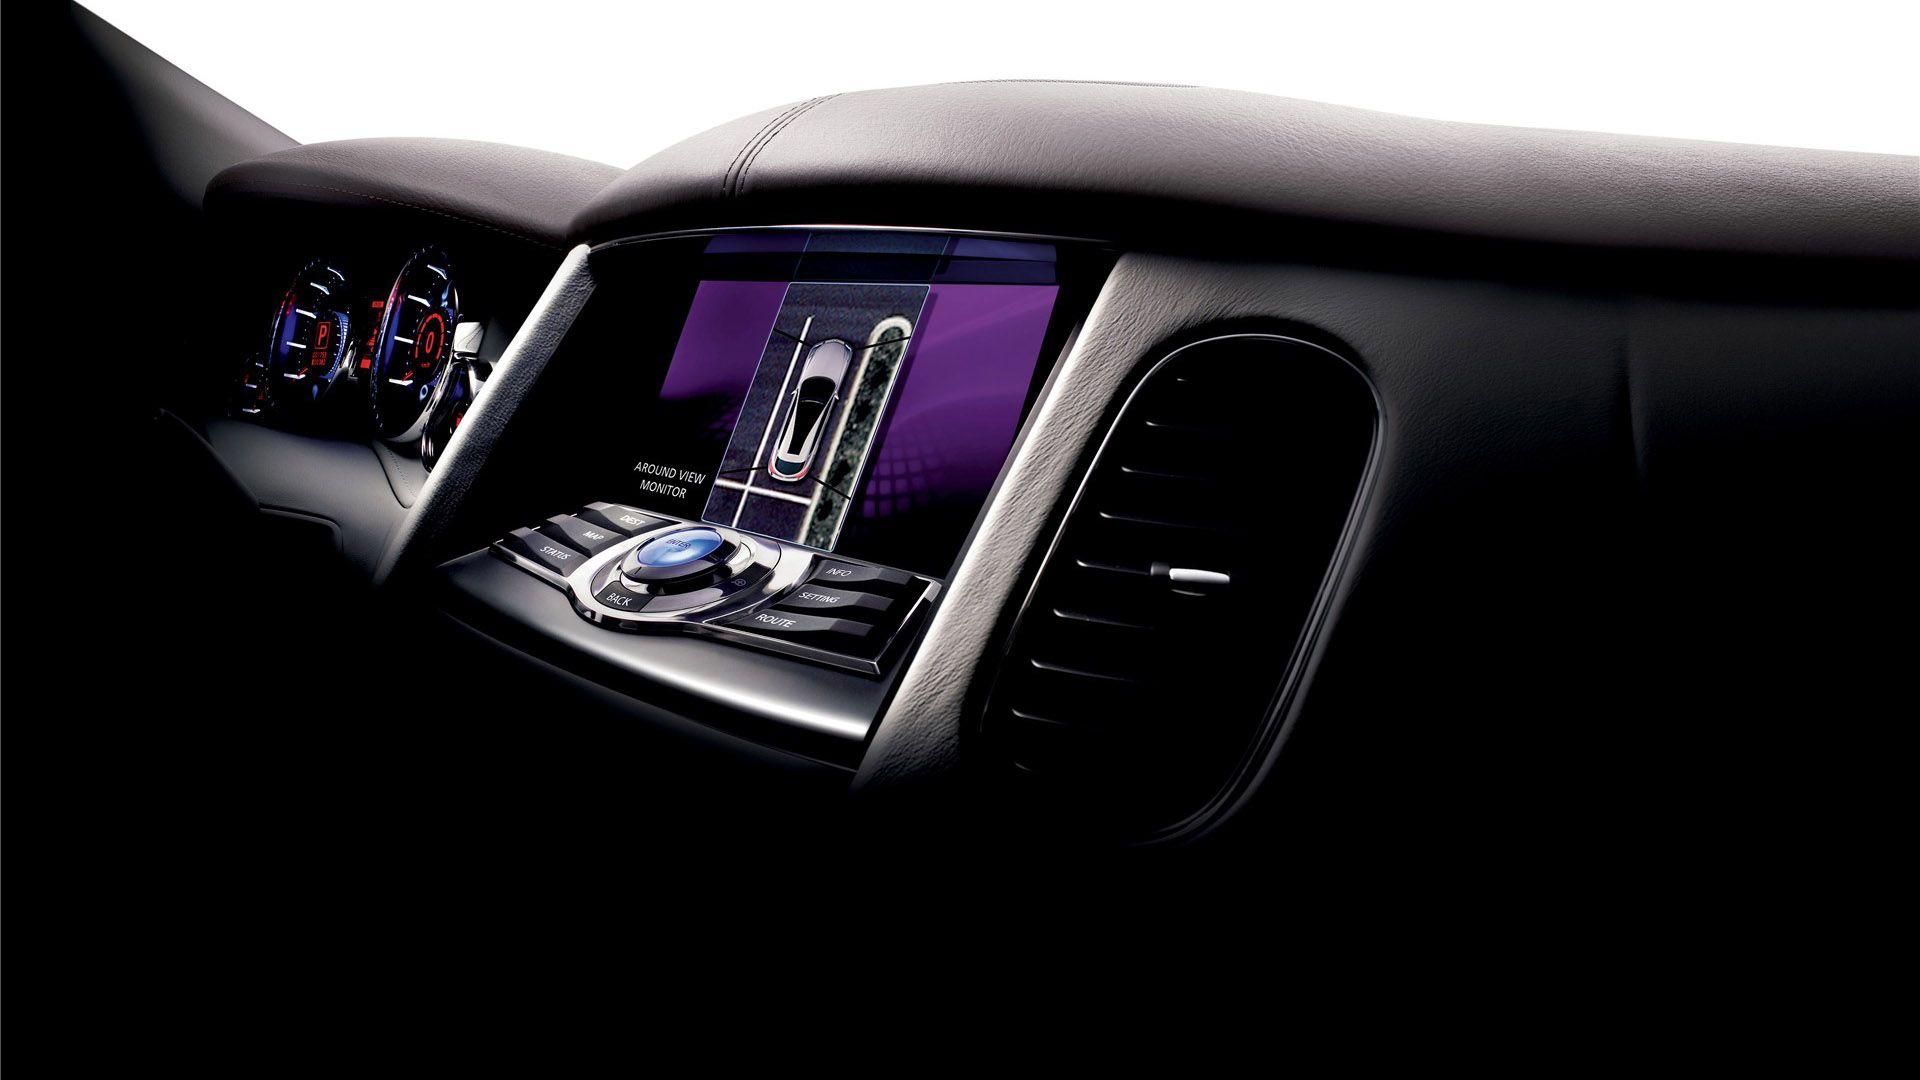 21+ Audio car wallpaper best